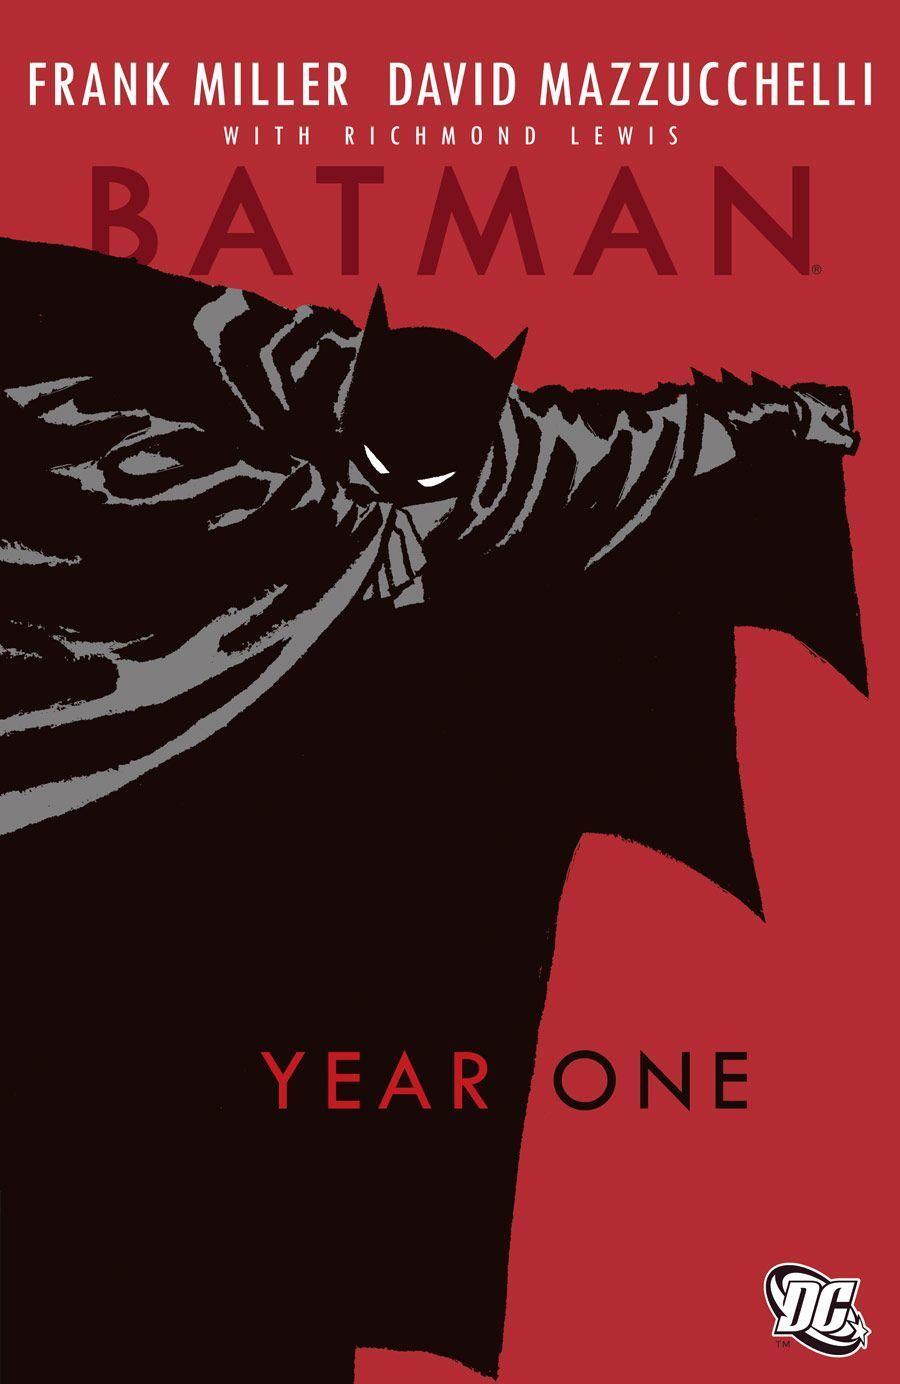 Darren Aronofsky wanted Joaquin Phoenix as Batman years before ...